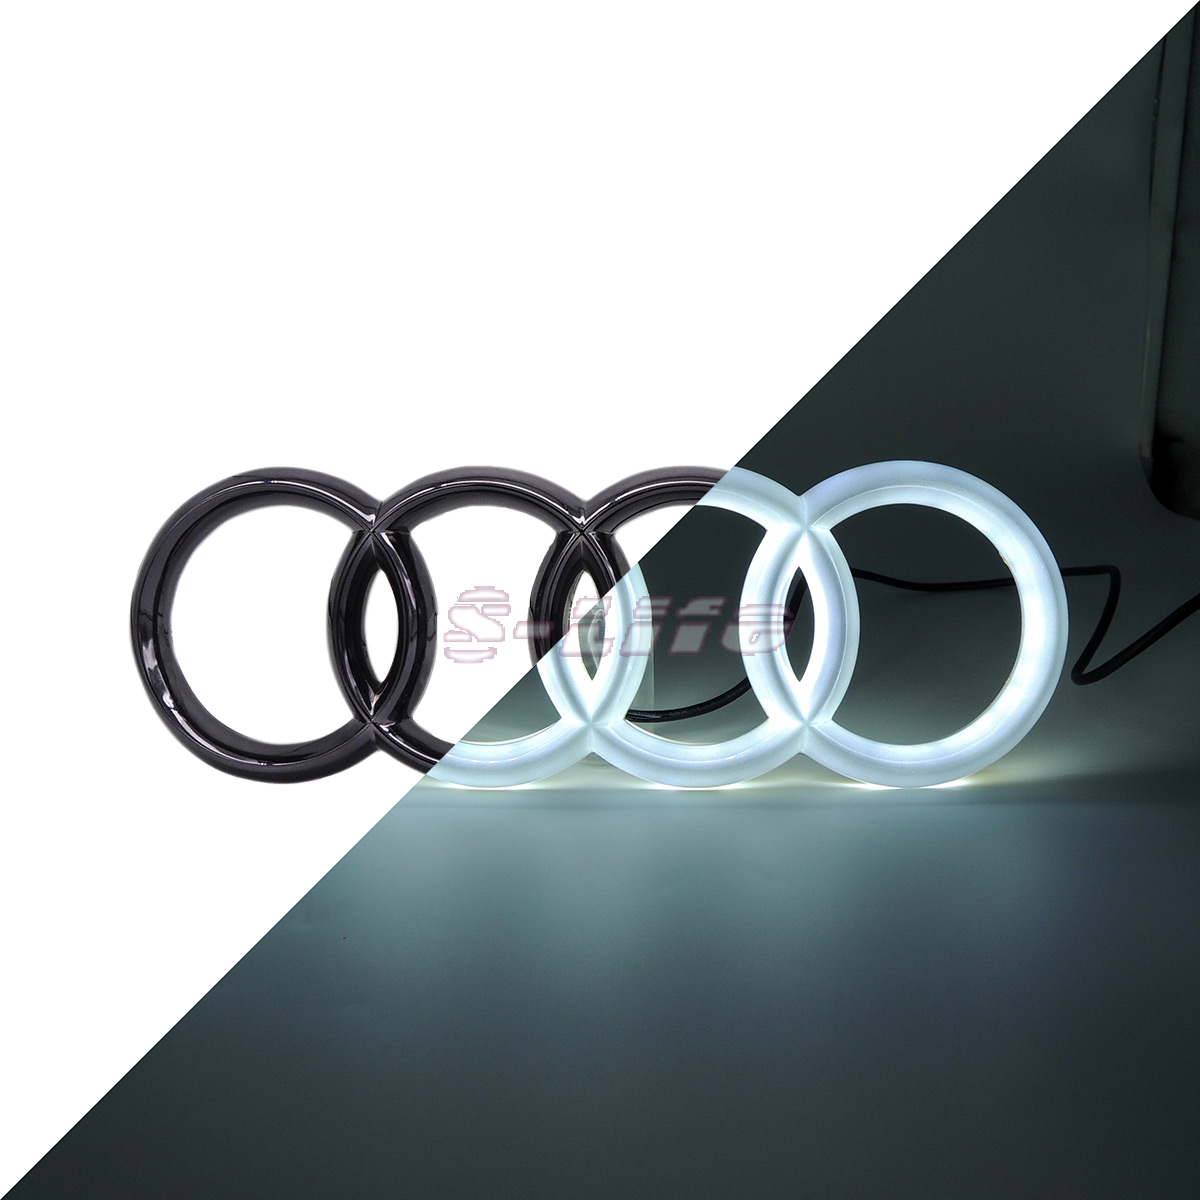 Motors Front Led Grille BlLED Logo Emblem Light Bulb For Audi A1 A3 A4 A5 RS3